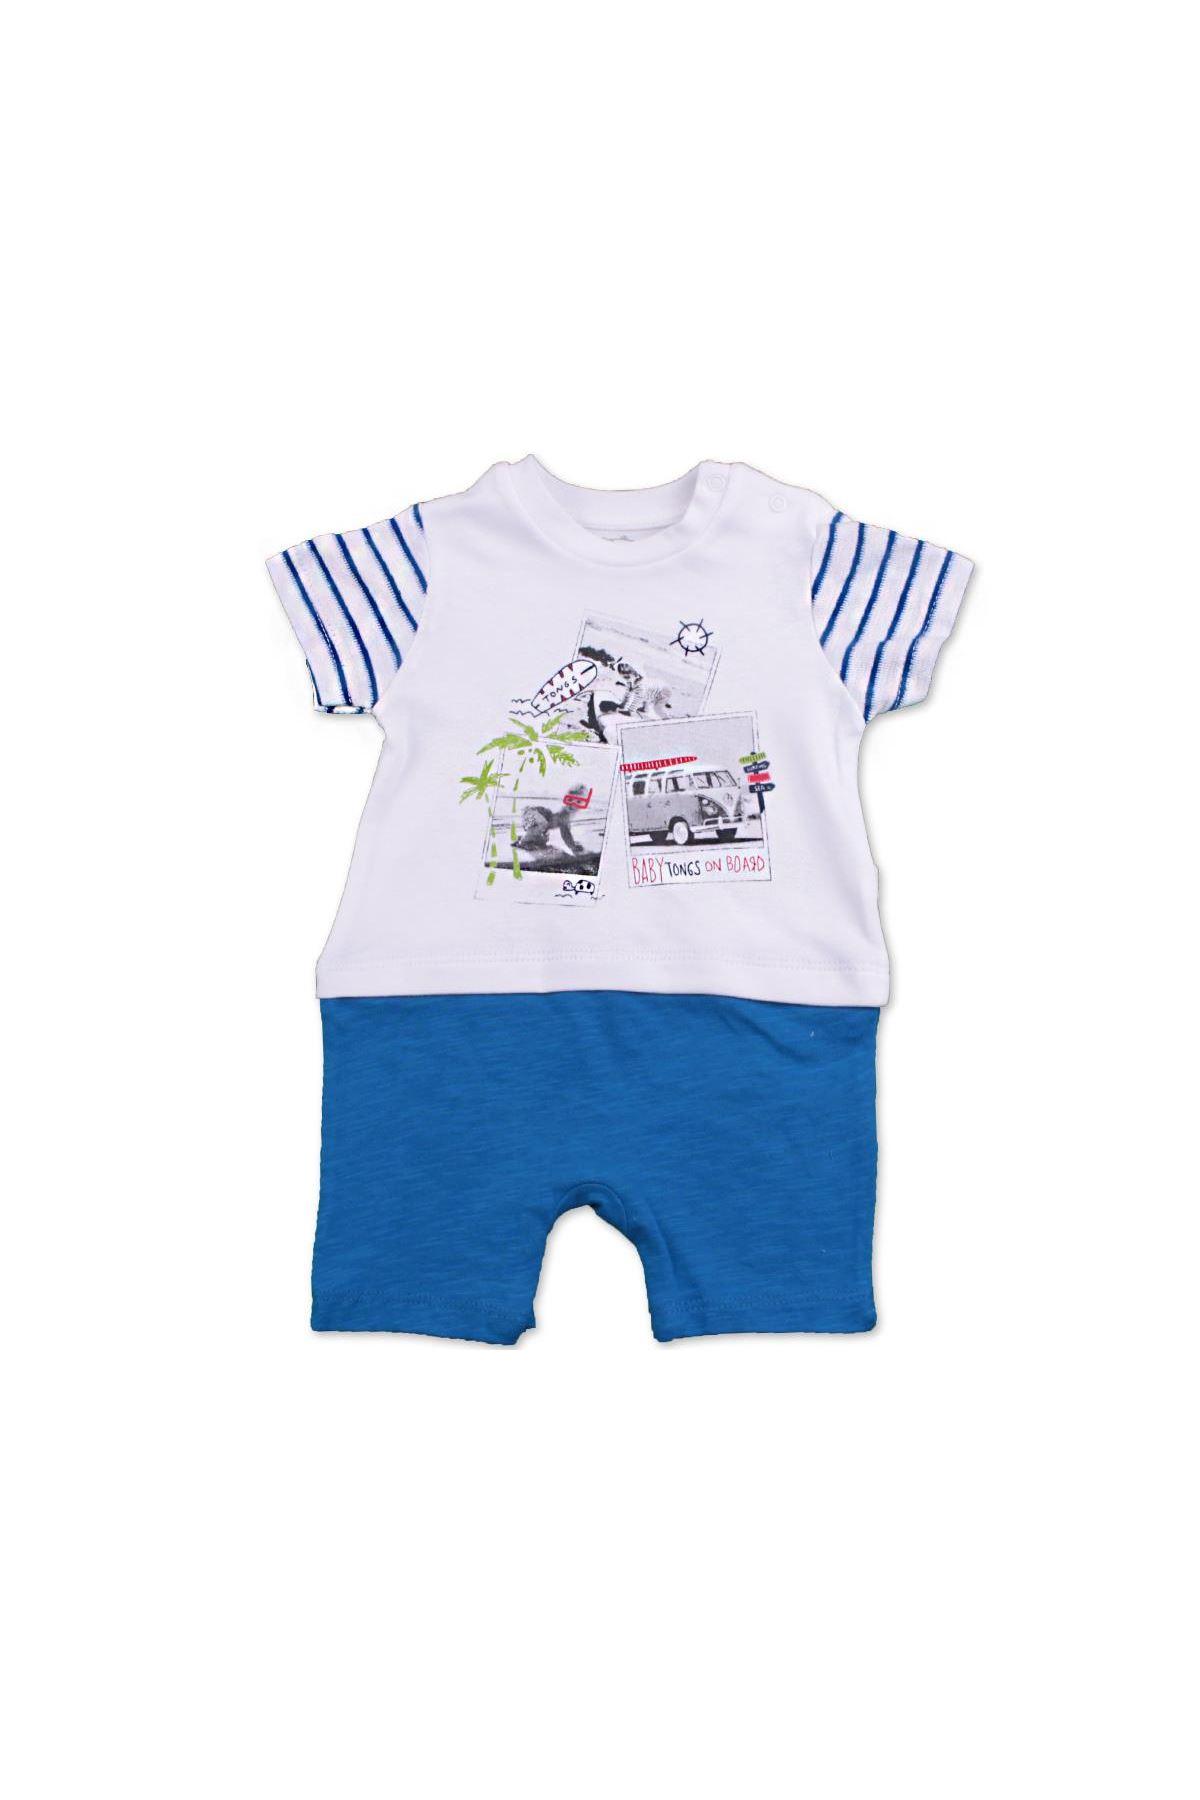 Tongs Baby On Board Tulum 2581 Mavi